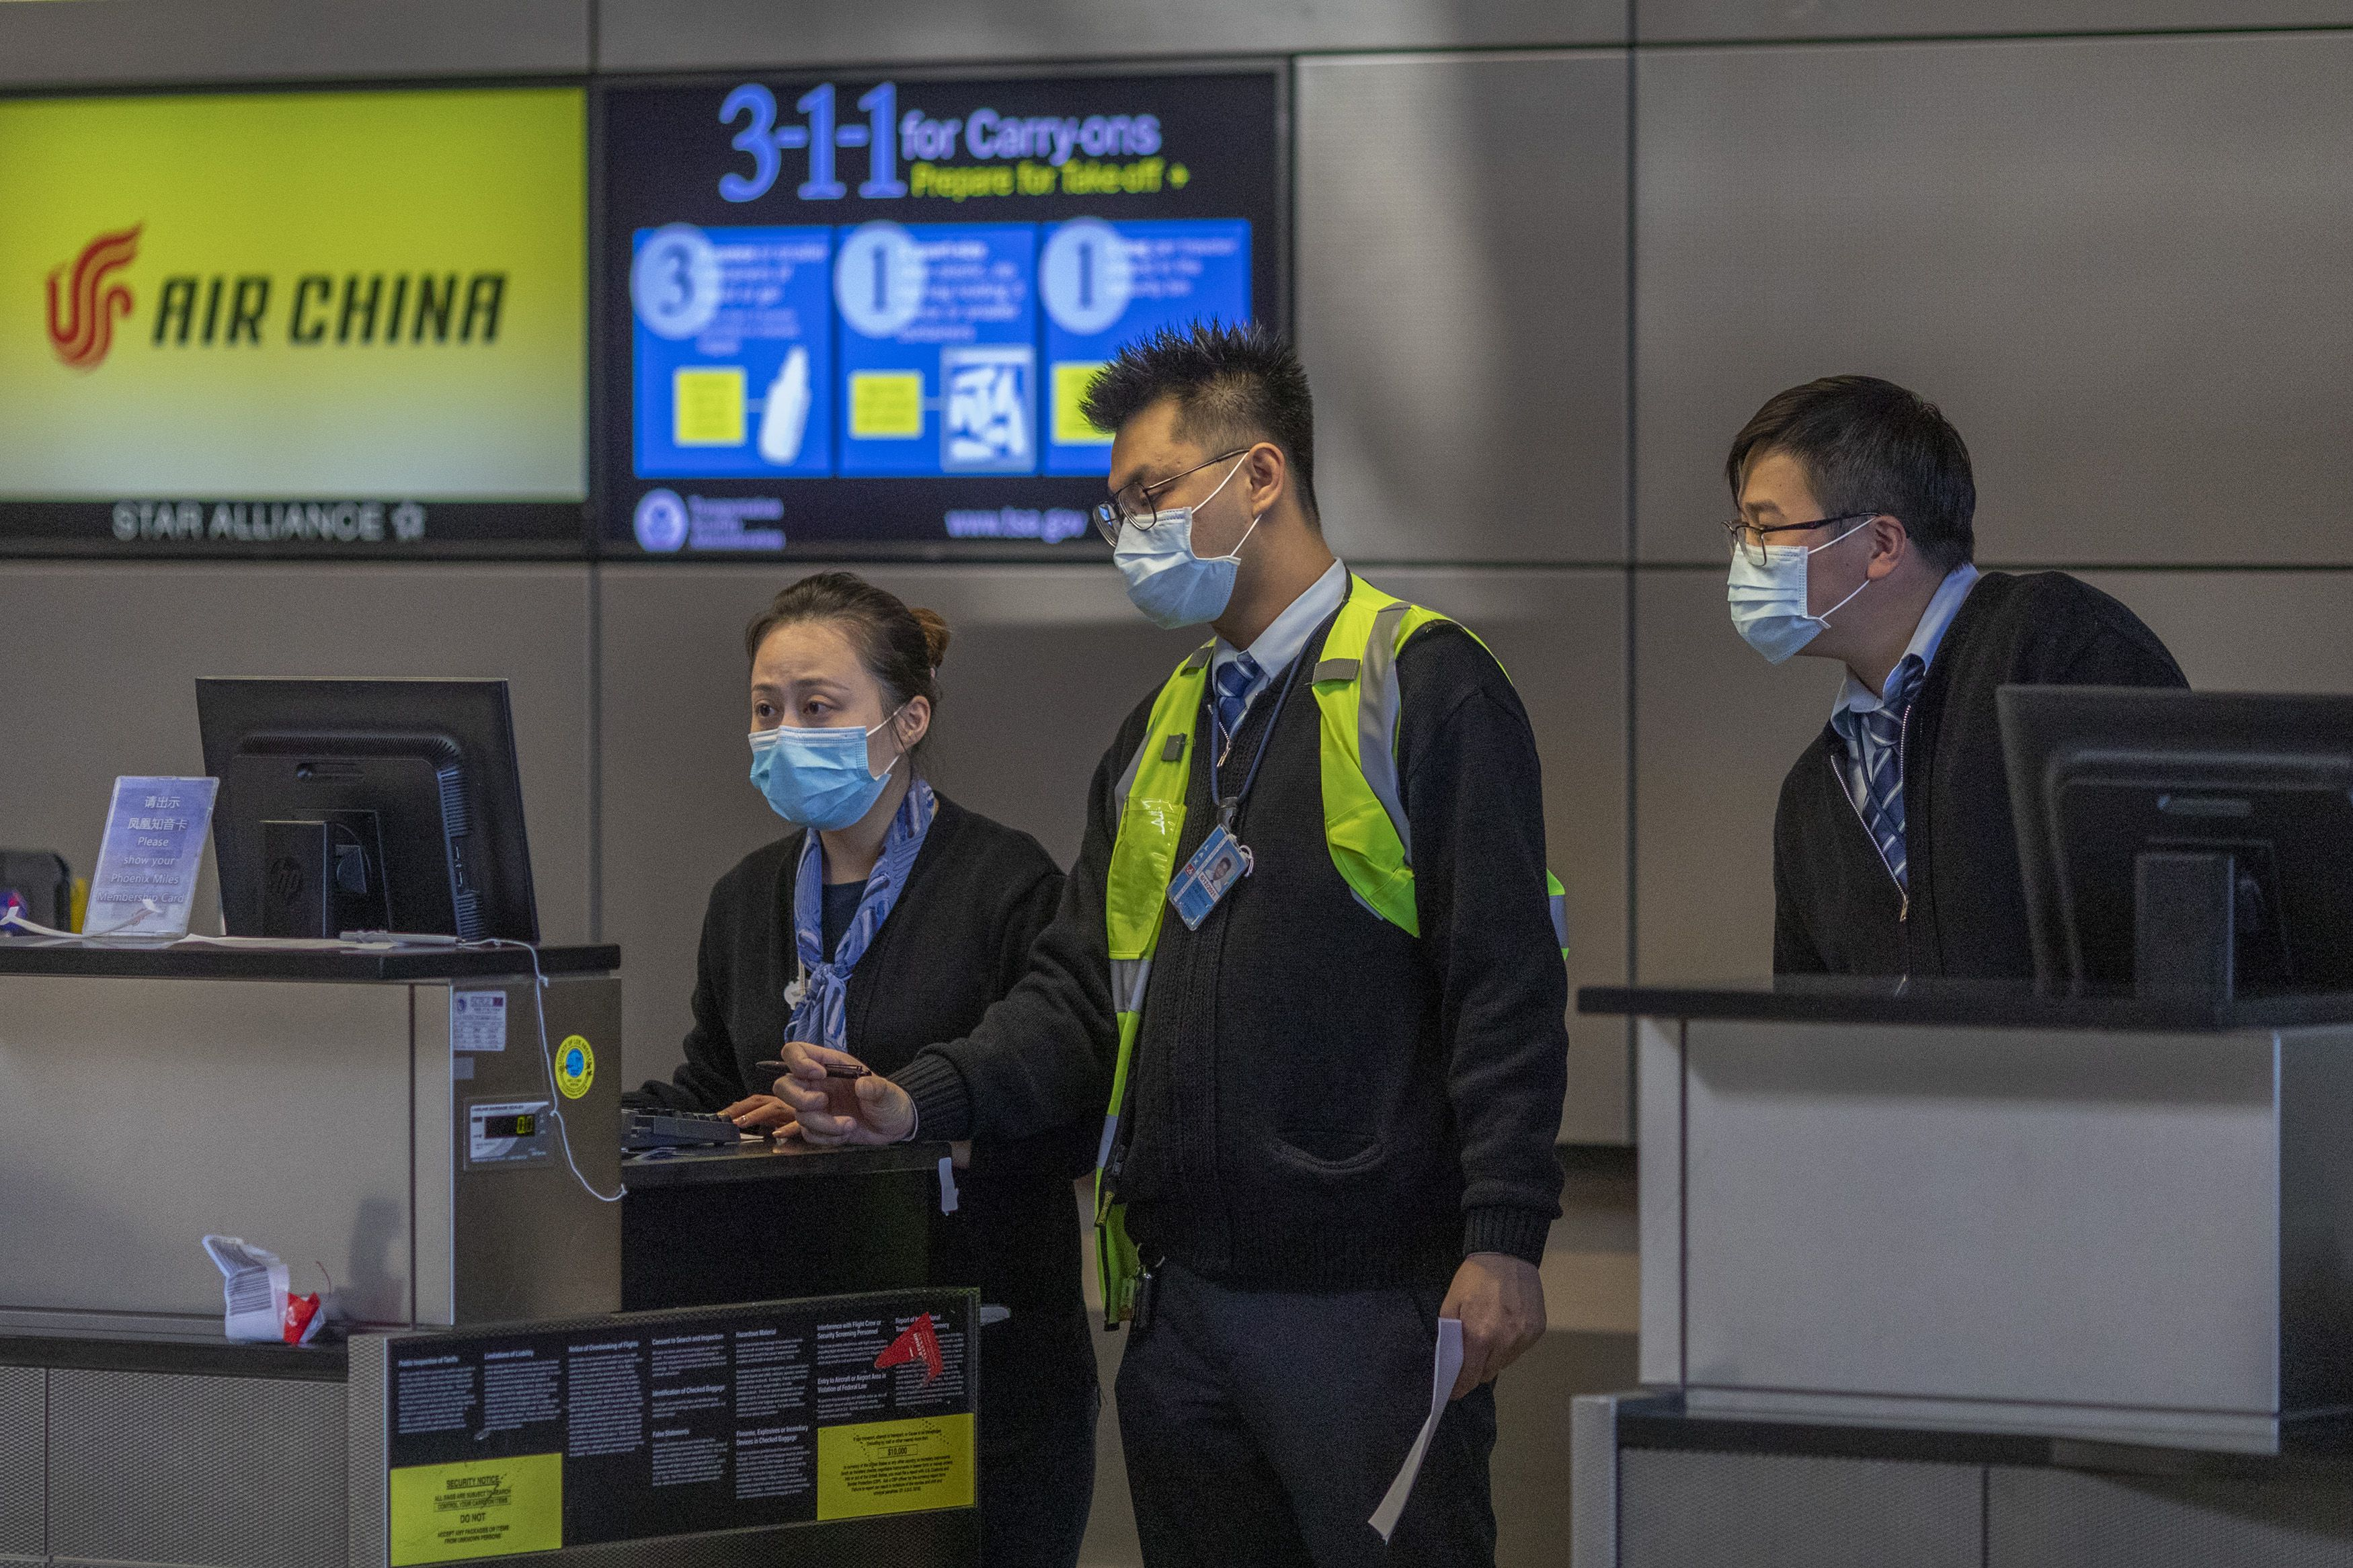 Direct flights from China brought 40k to U.S. after Trump coronavirus travel ban